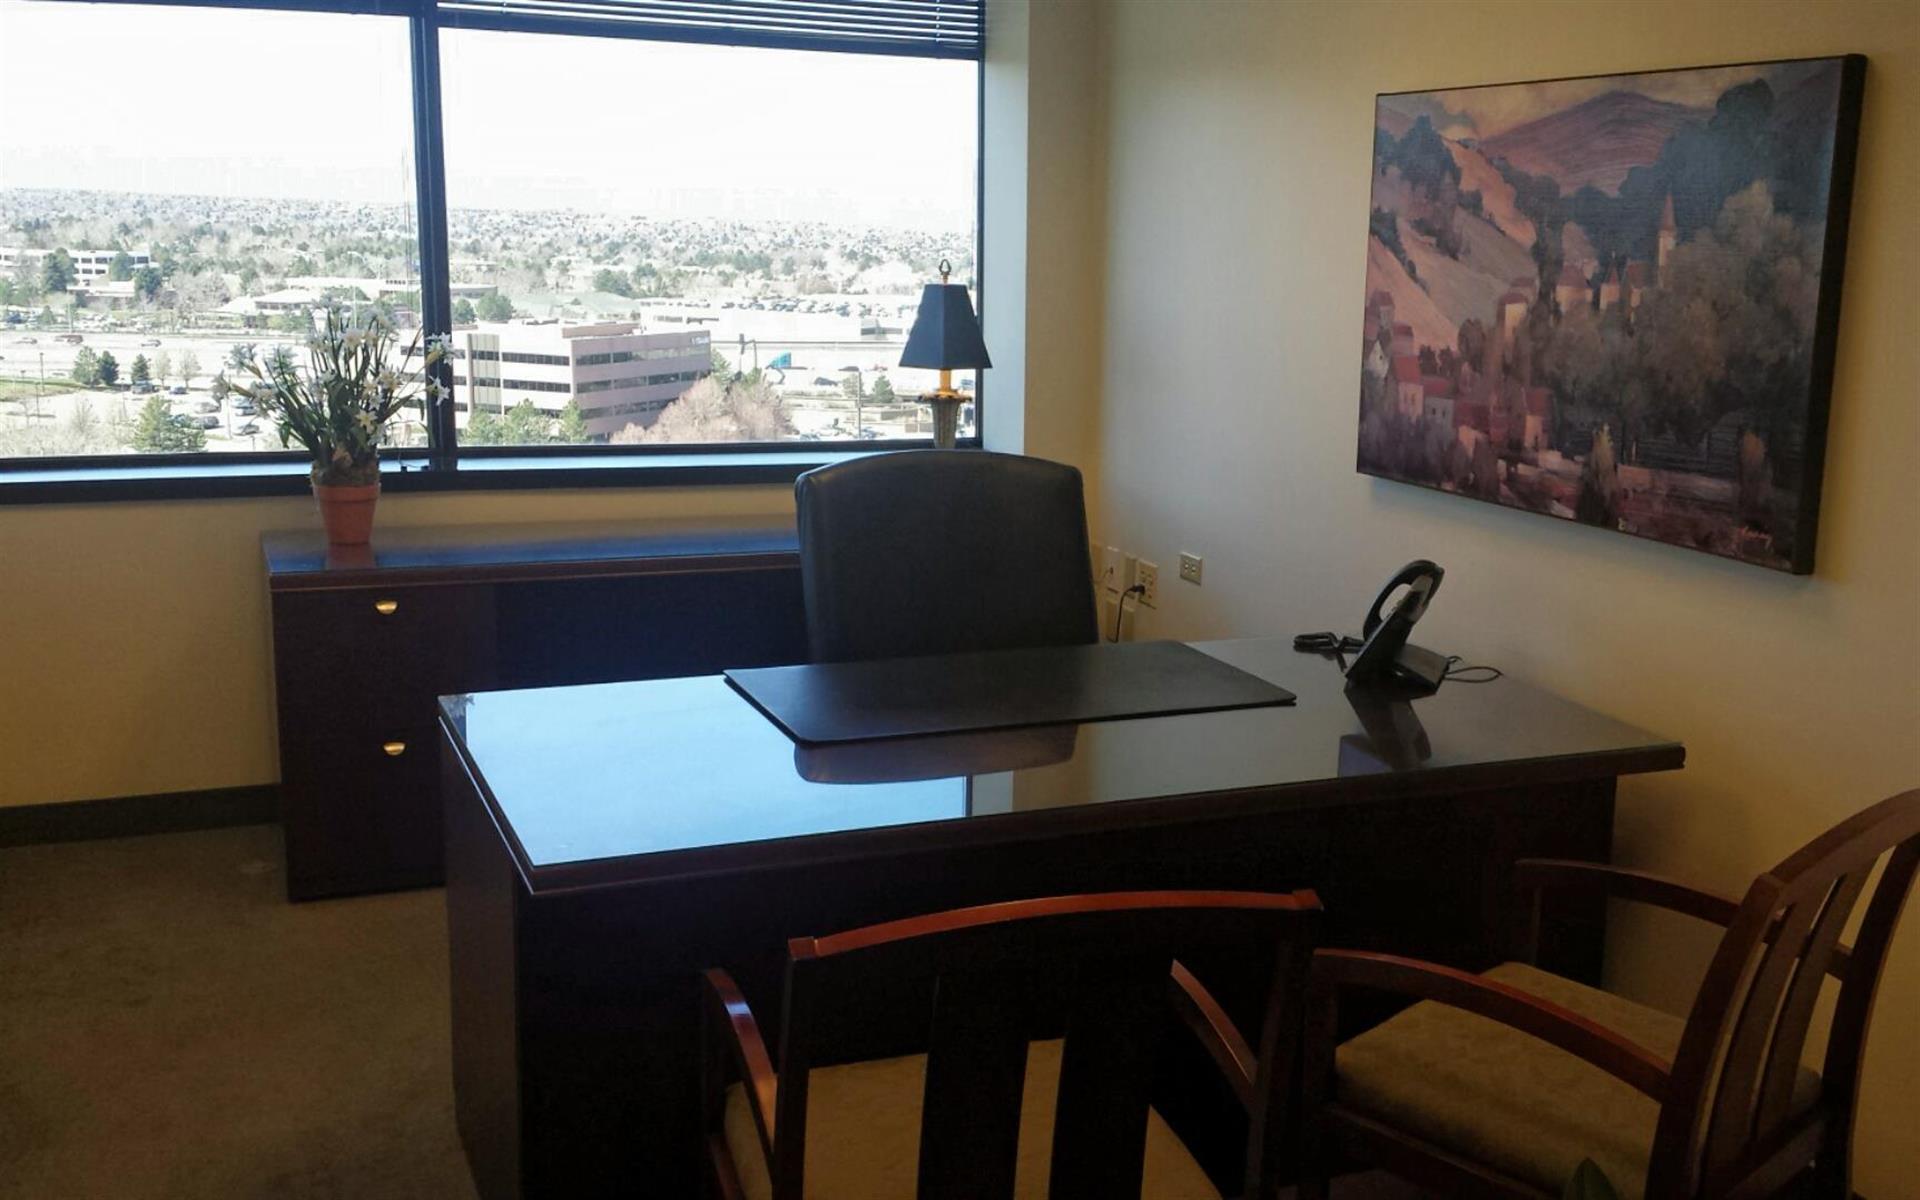 Executive Business Centers Denver Tech Center - Exterior Office with Amazing Views!